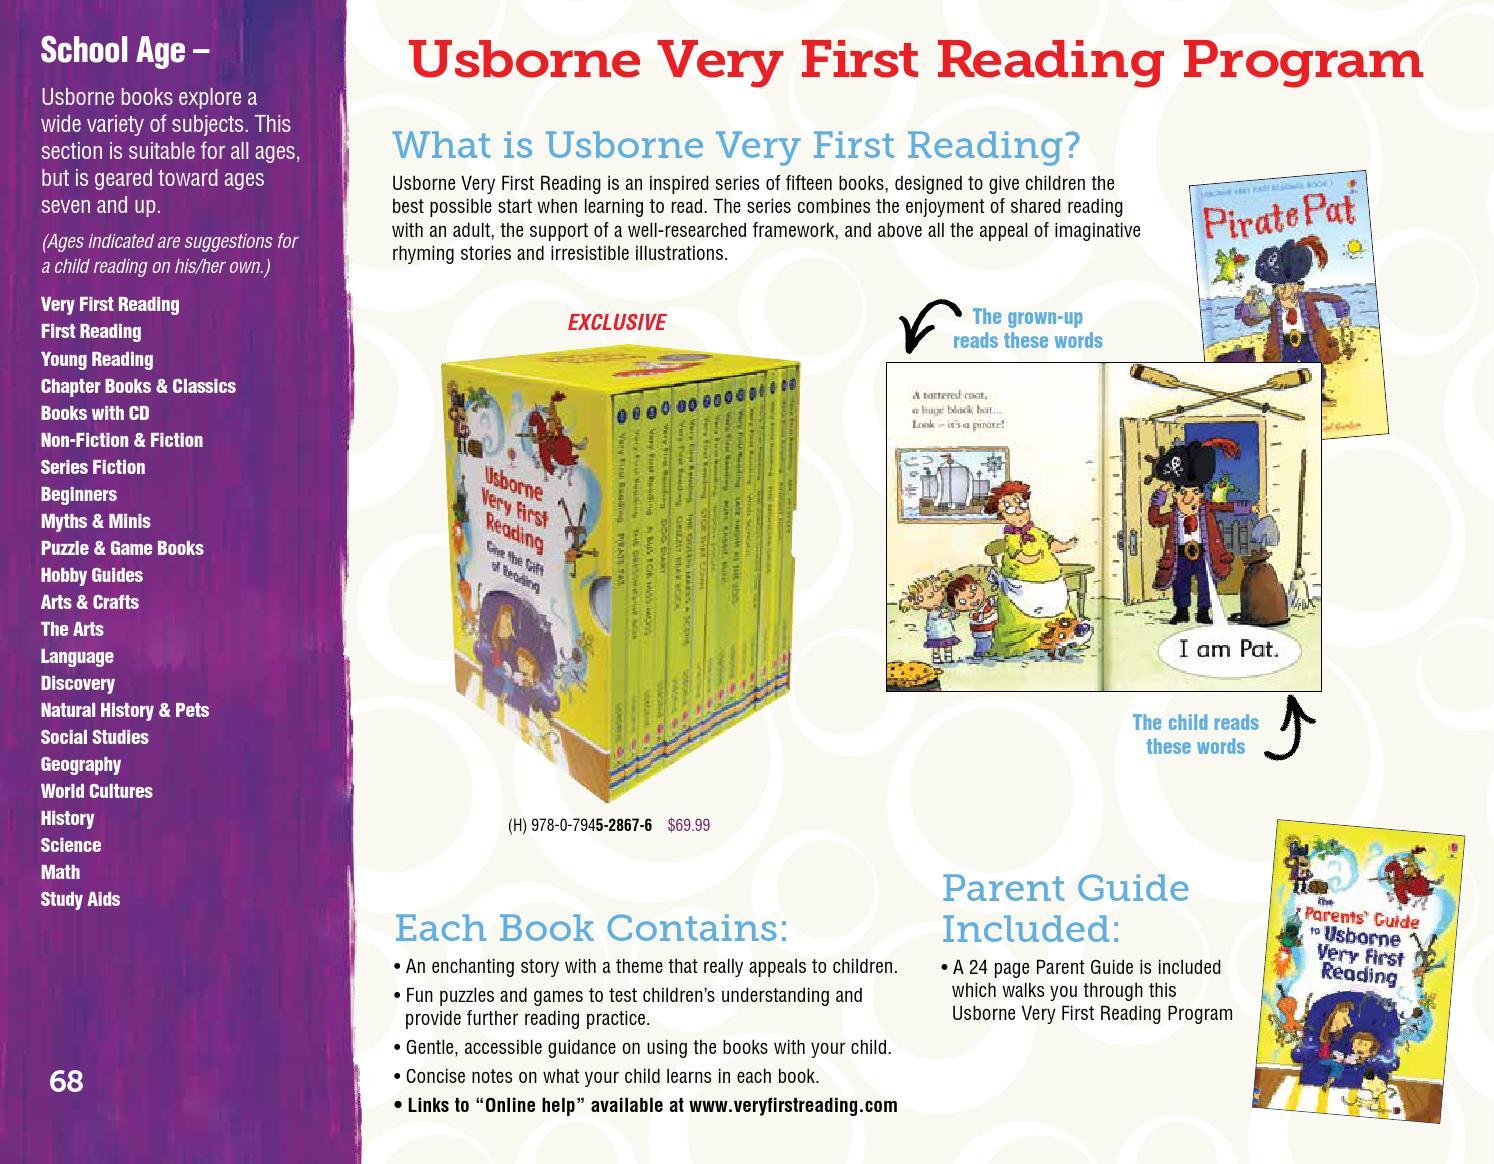 #reading Archives - UBAM Love: The Literary Spark